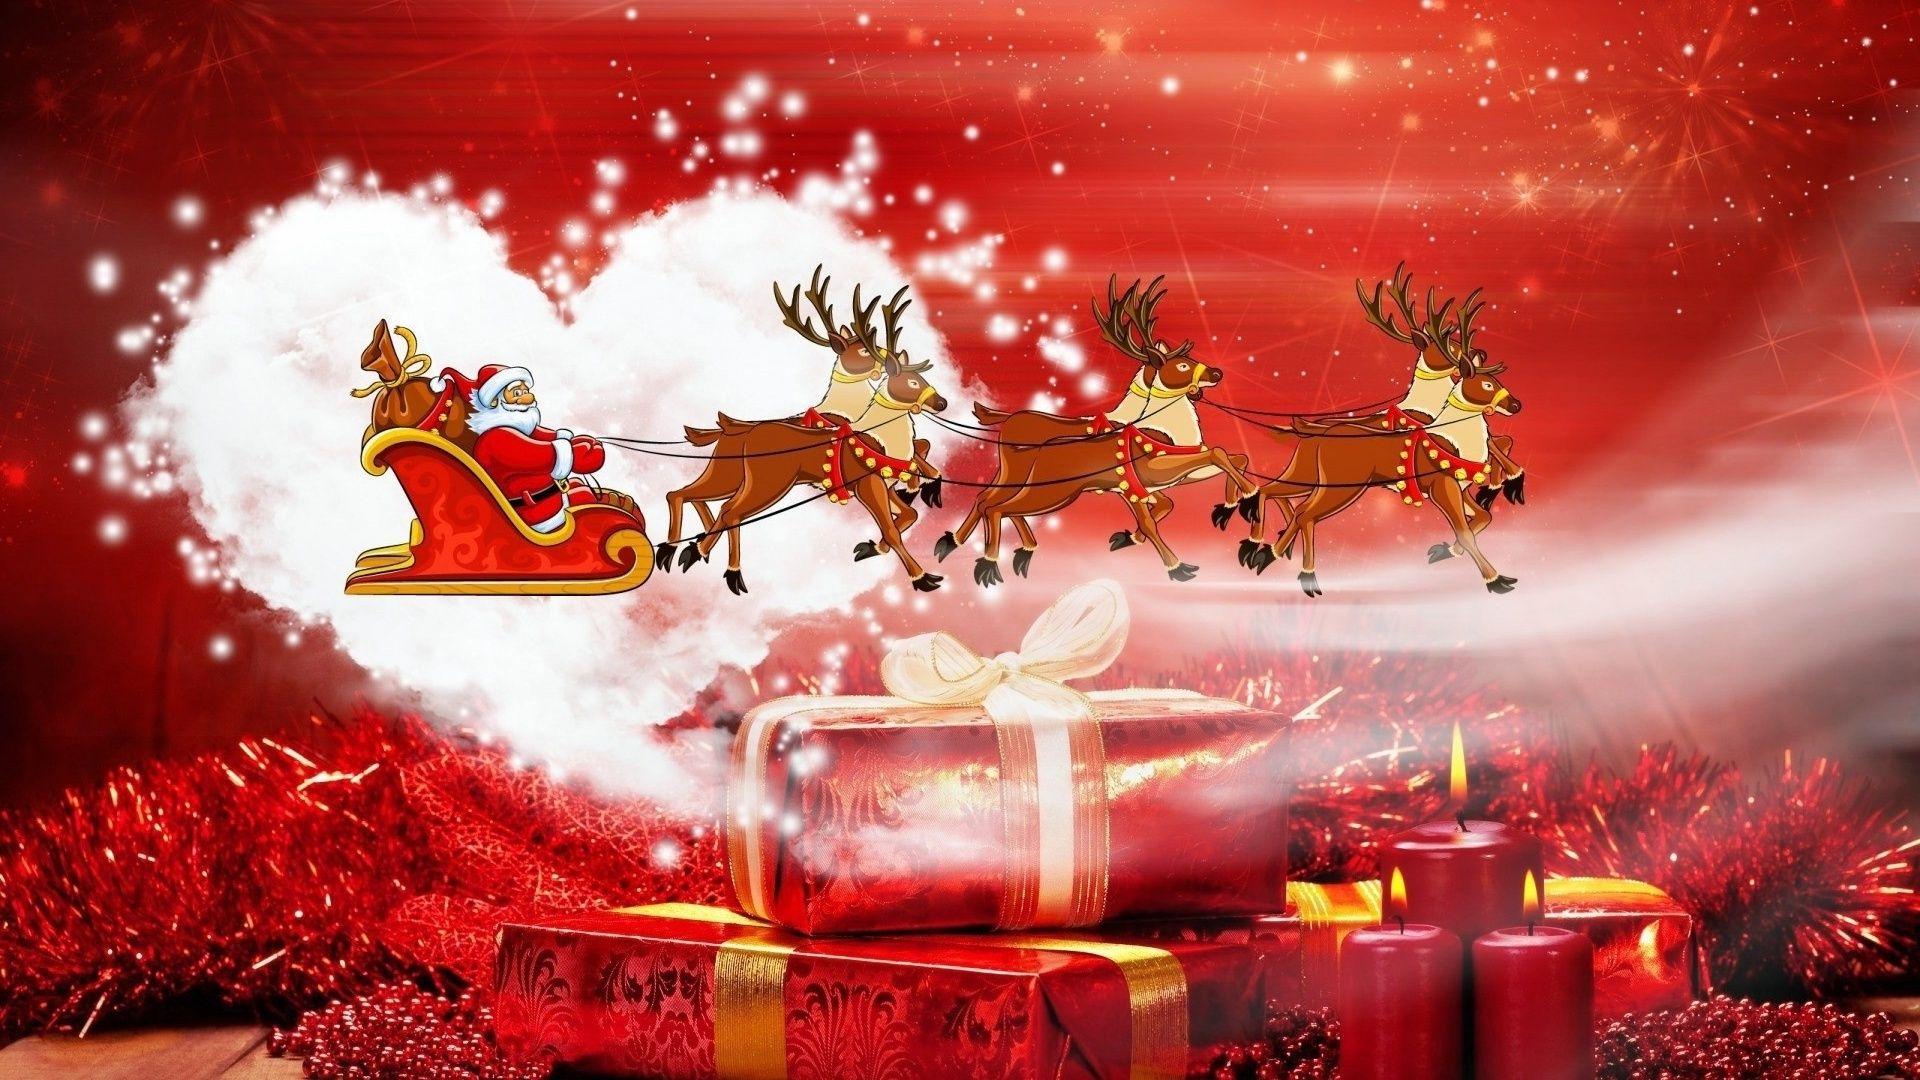 Santa Claus wallpaper photo hd